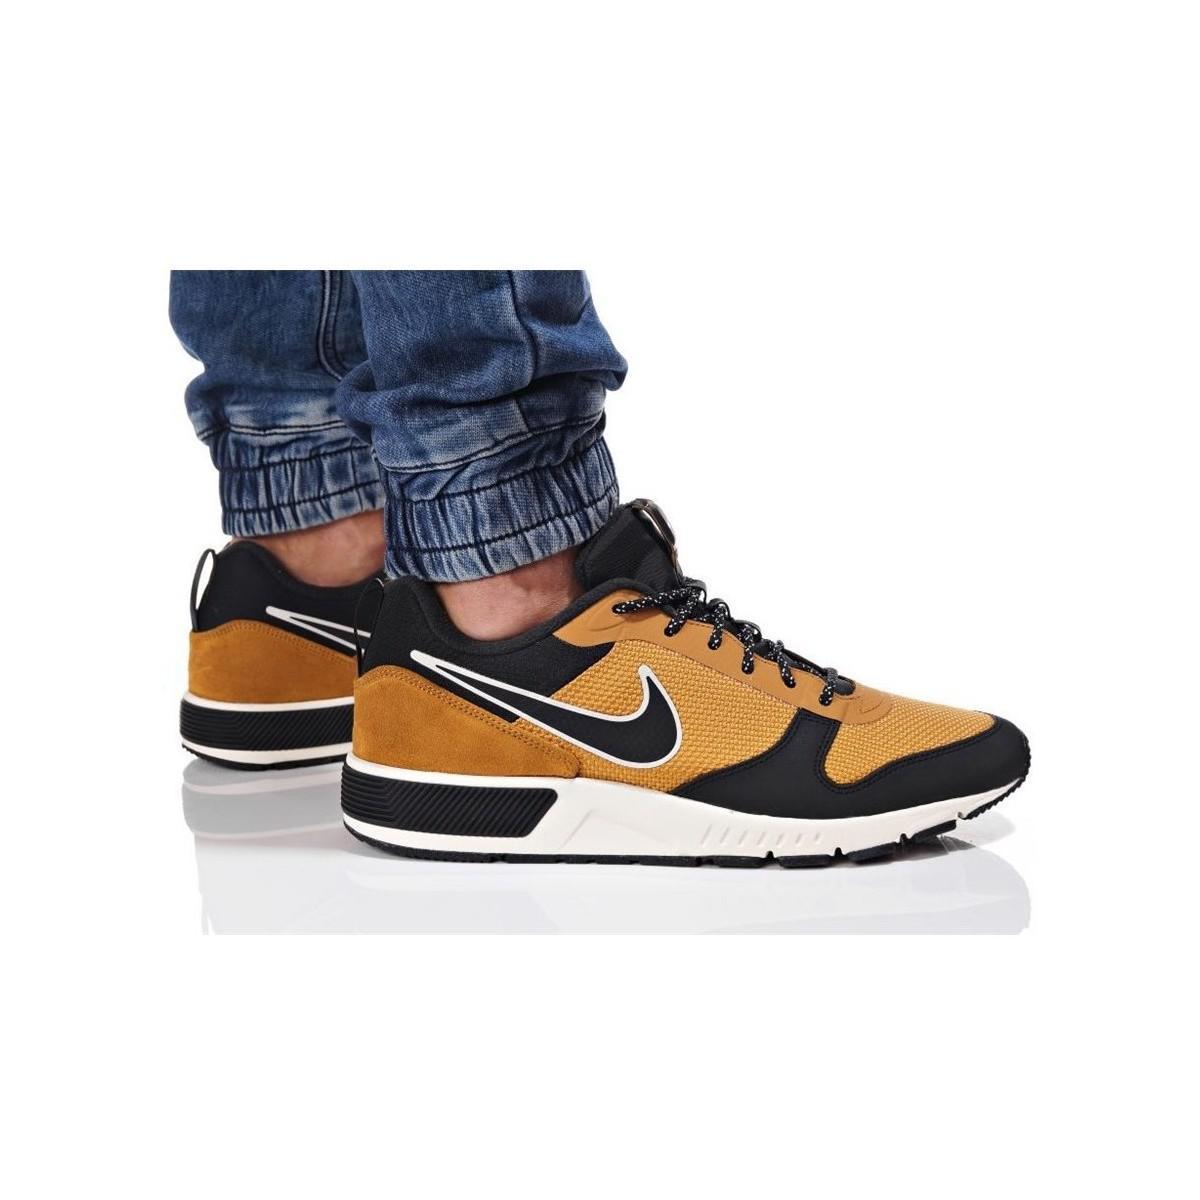 size 40 e5b1b 79d54 Nike - Brown Nightgazer Trail hommes Chaussures en Marron for Men - Lyst.  Afficher en plein écran